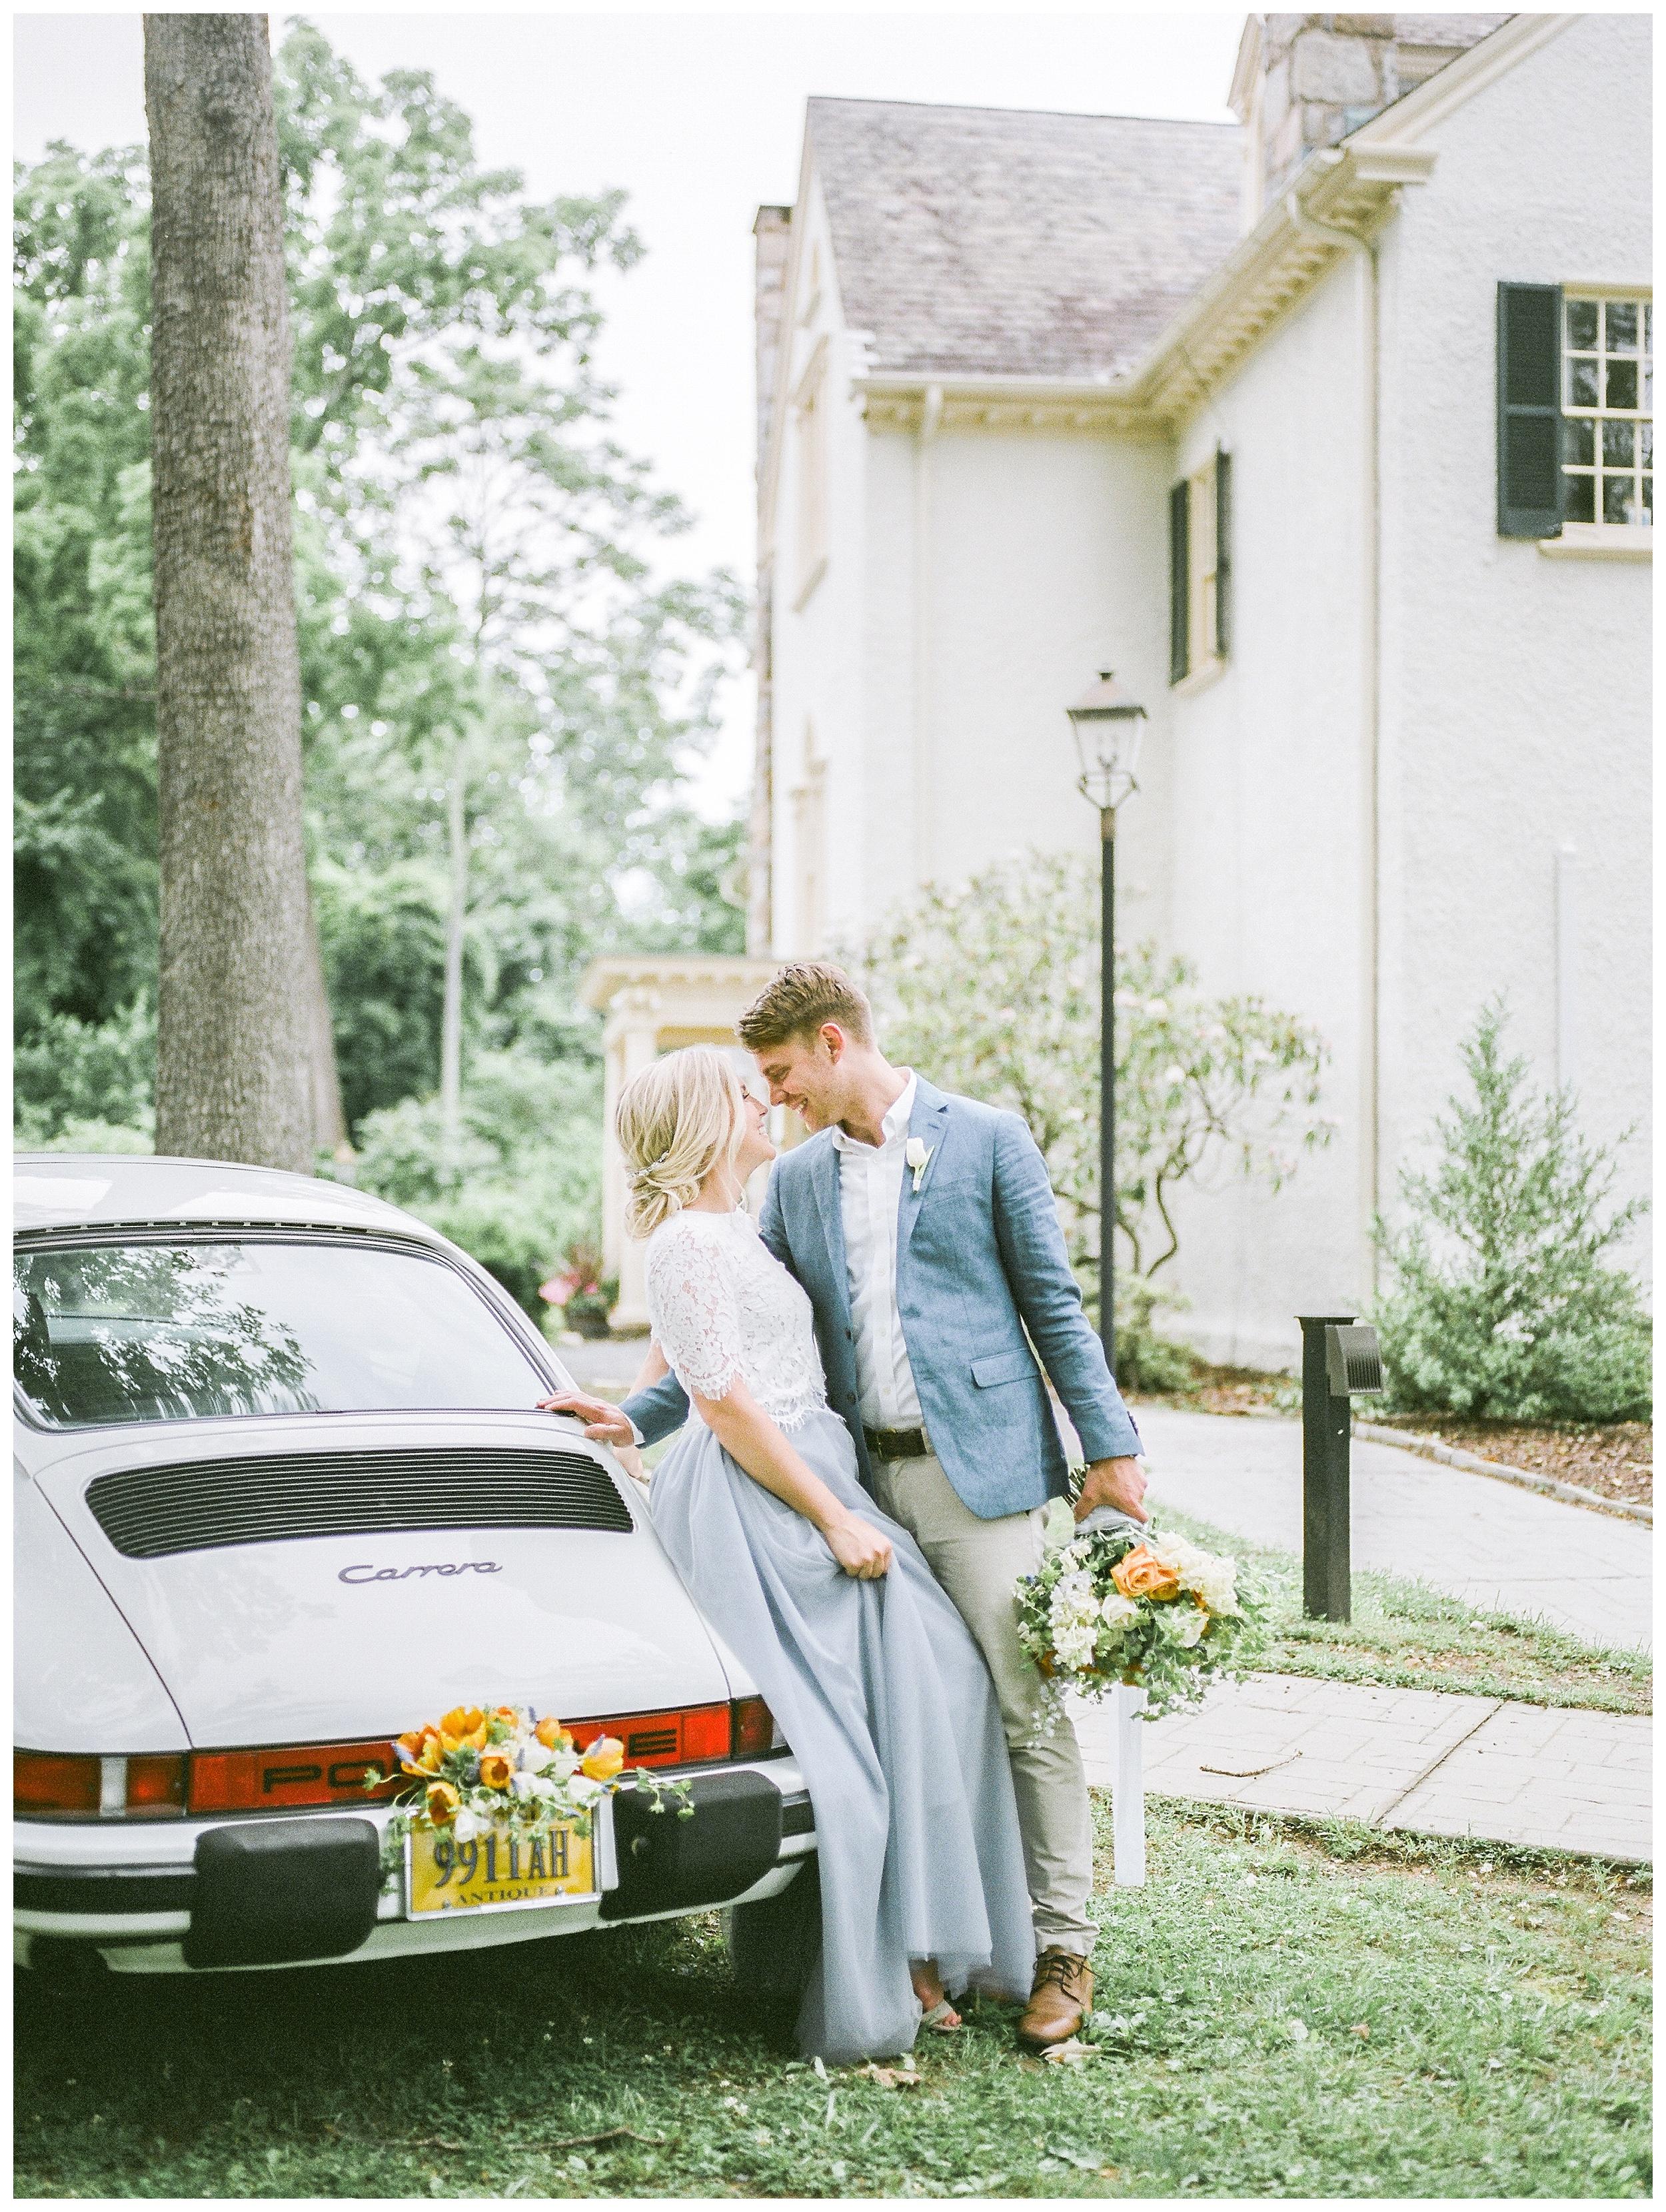 Rust Manor Wedding   Virginia Wedding Photographer Kir Tuben_0017.jpg